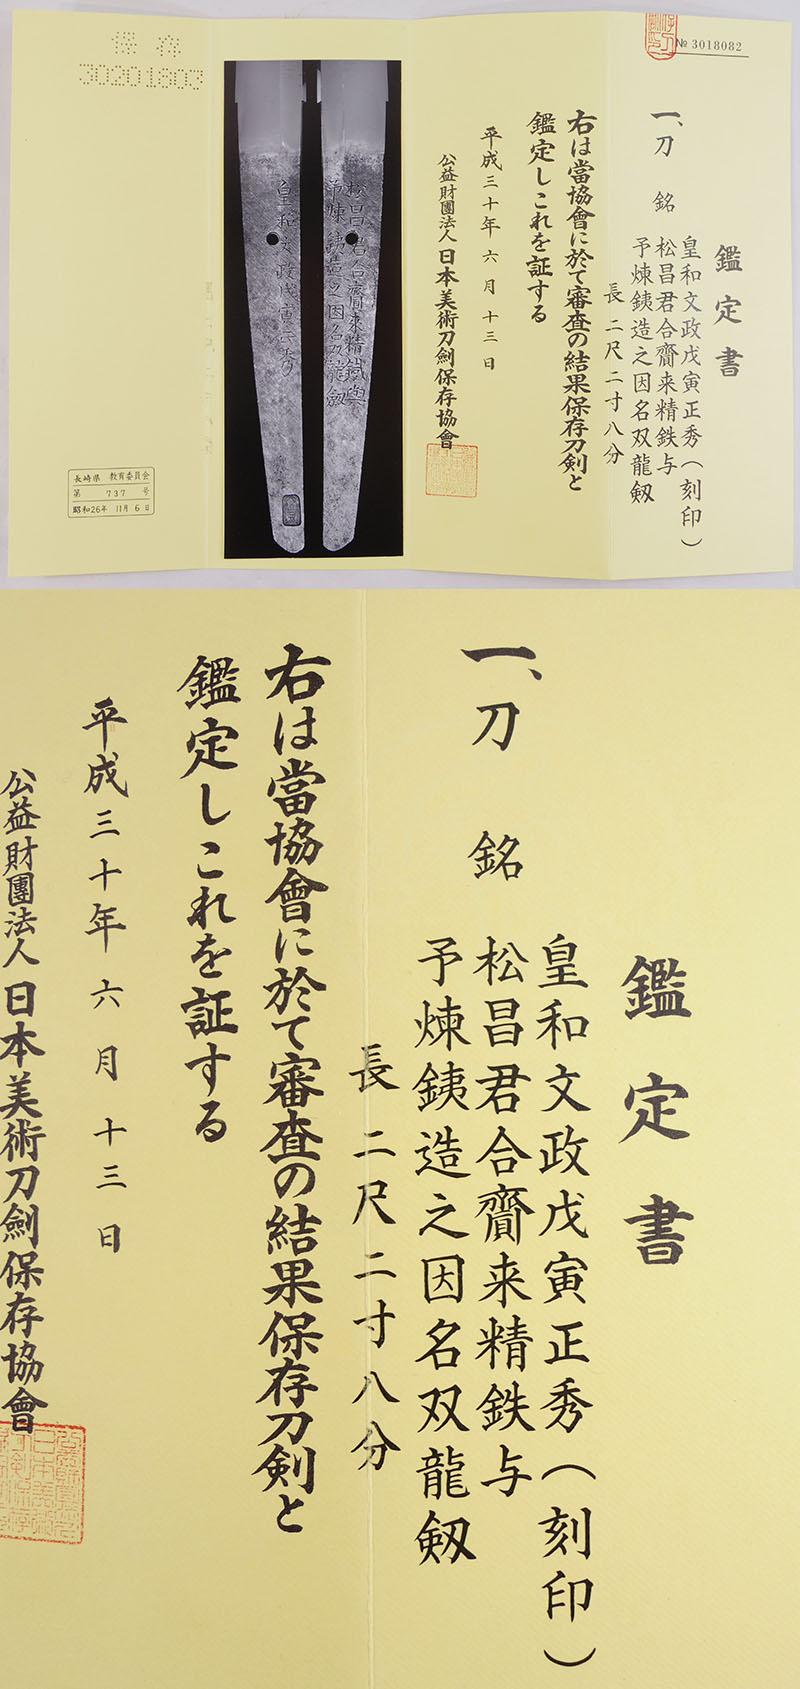 皇和文政戊寅正秀 Picture of Certificate